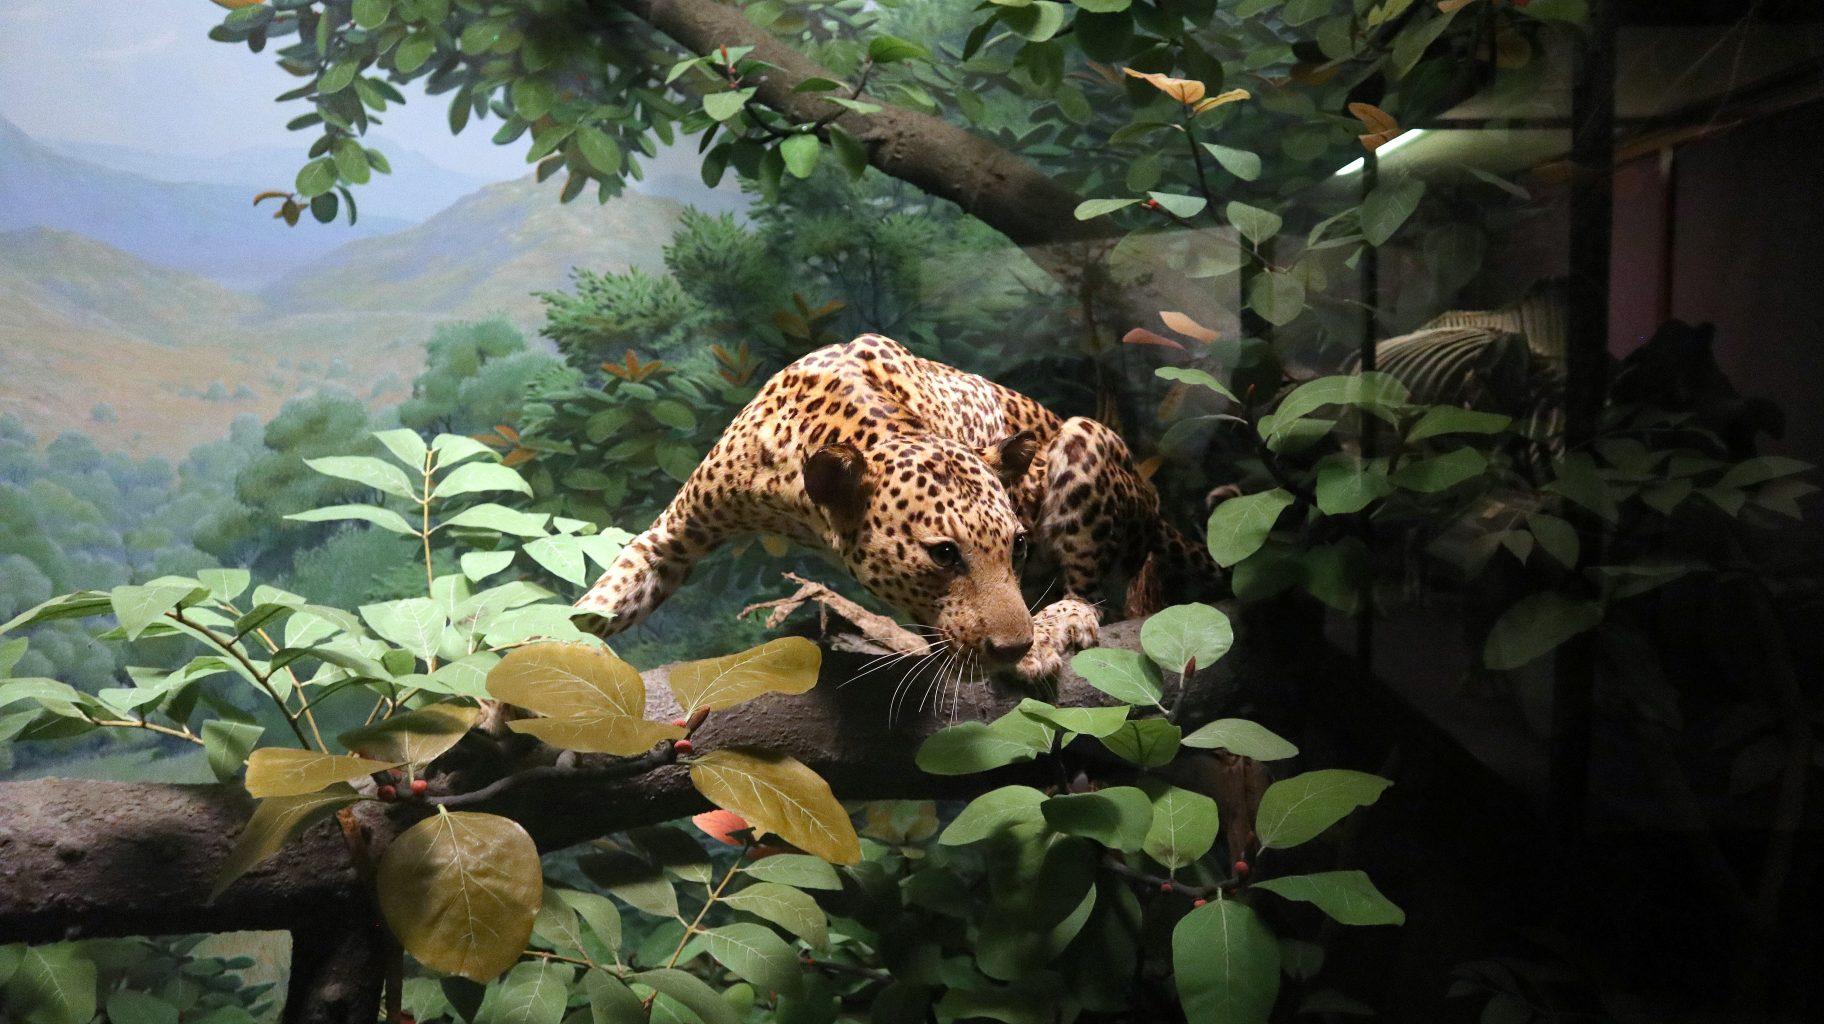 Leopardo disecado. Field Museum